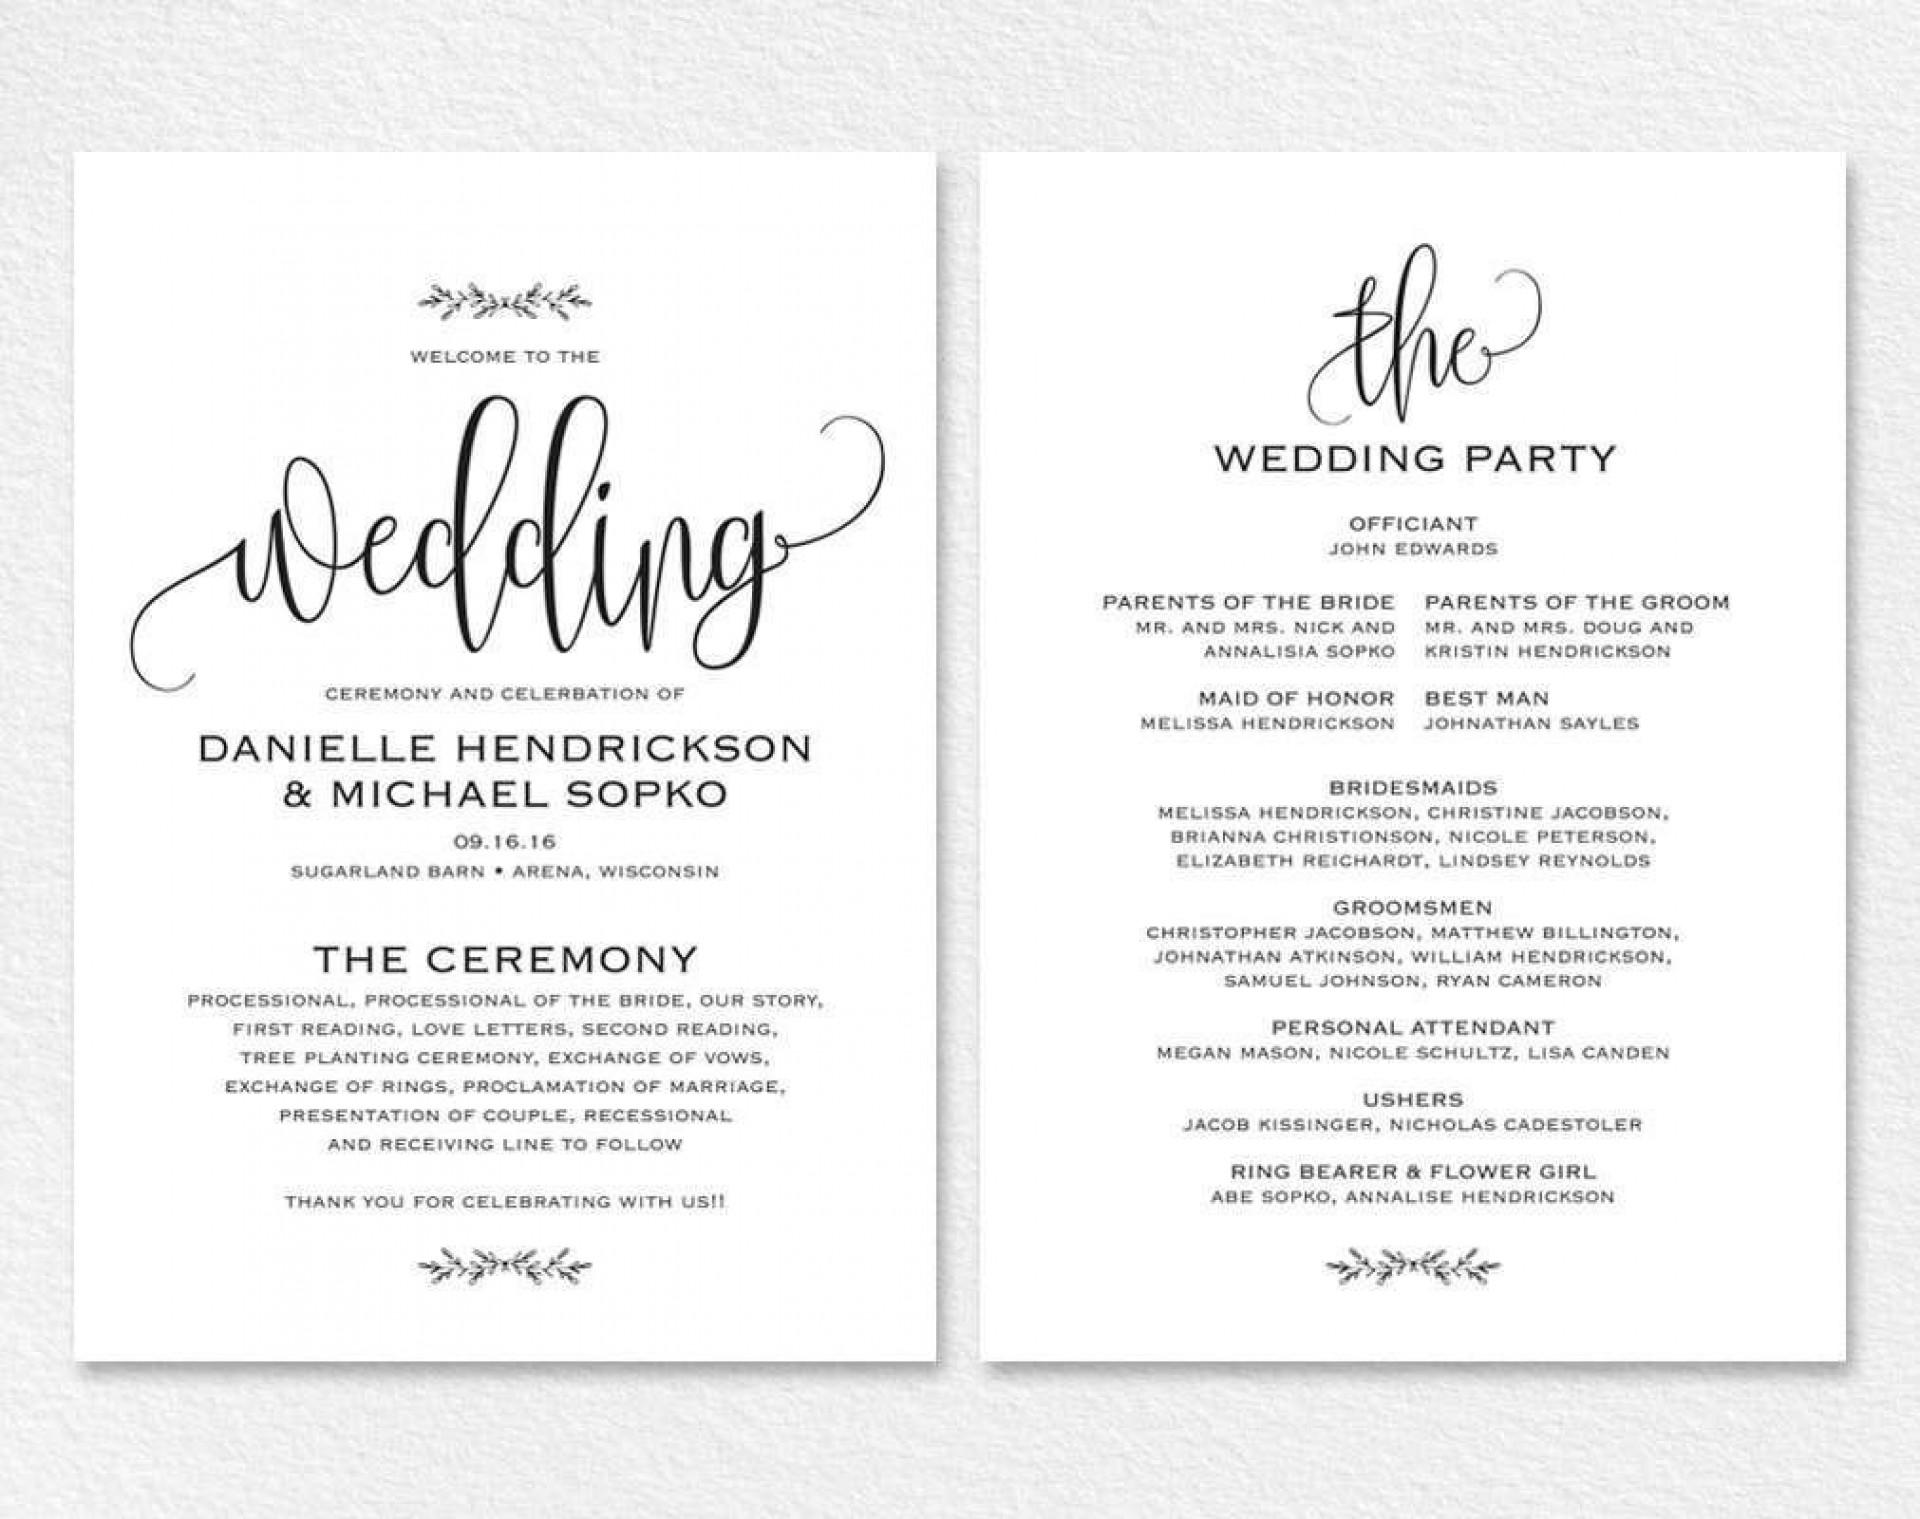 000 Fantastic Microsoft Word Wedding Invitation Template Sample  Templates M Editable Free Download Chinese1920